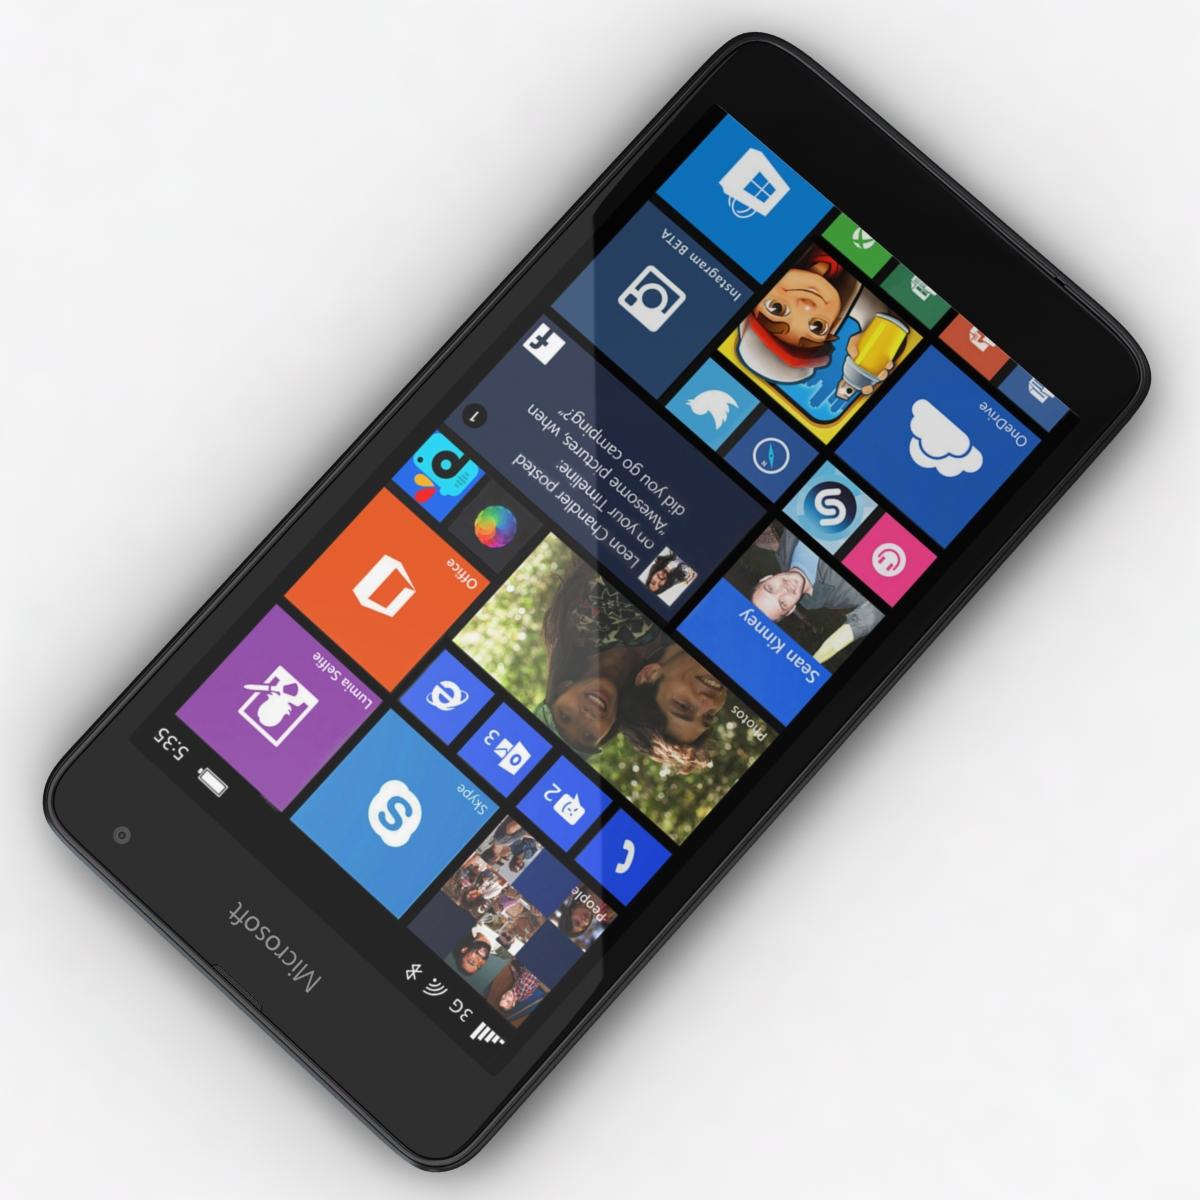 microsoft lumia 535 and dual sim black 3d model 3ds max fbx c4d obj 204353